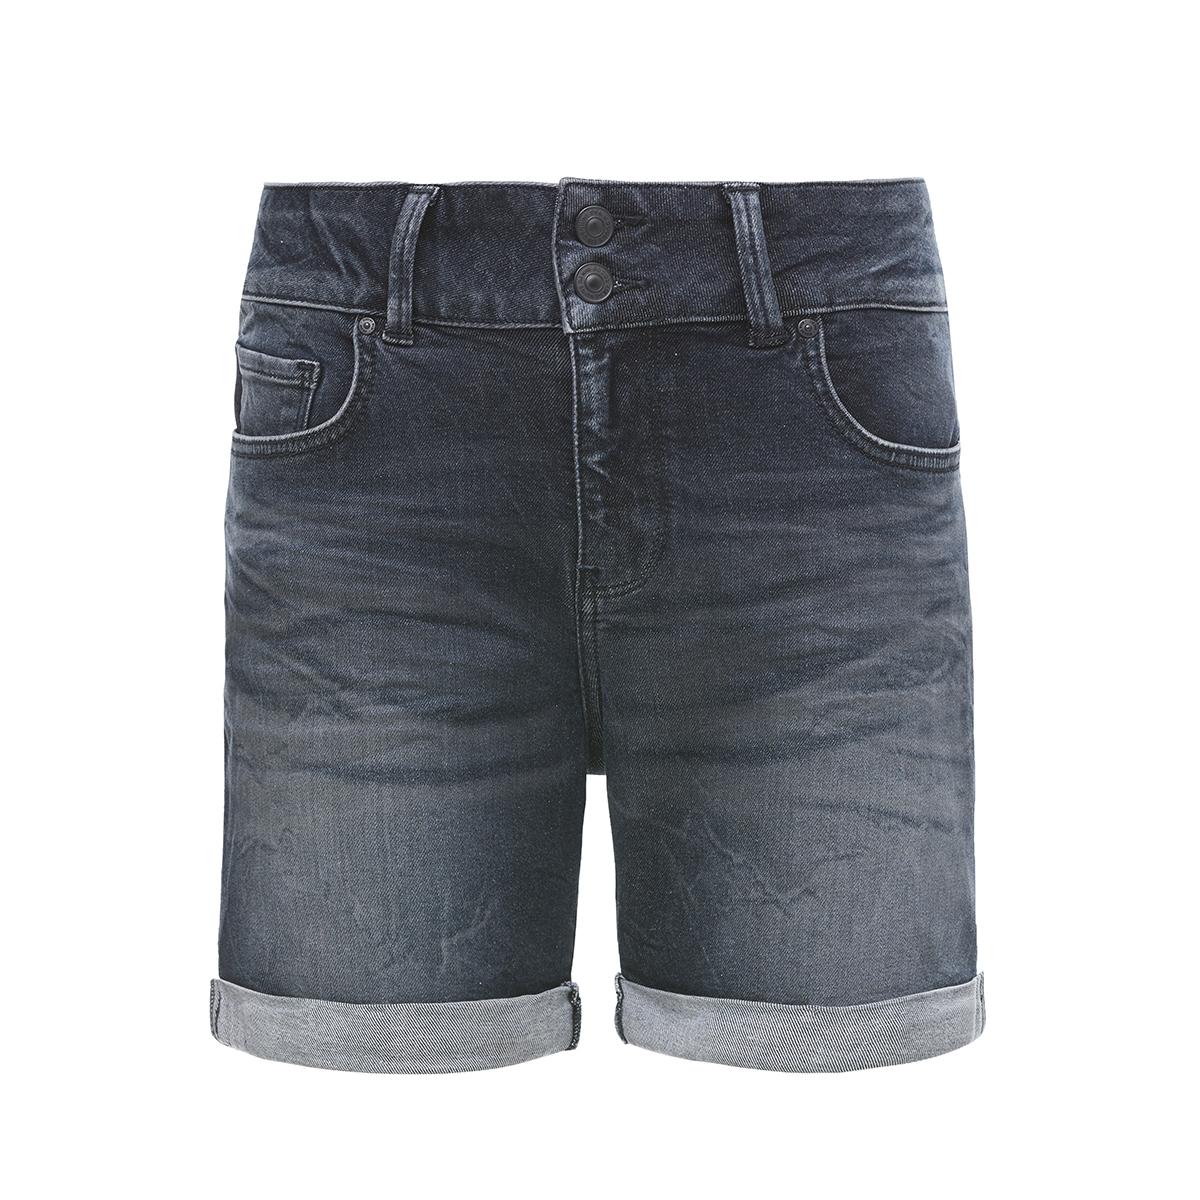 becky x 60645 ltb korte broek 52375 oisa wash